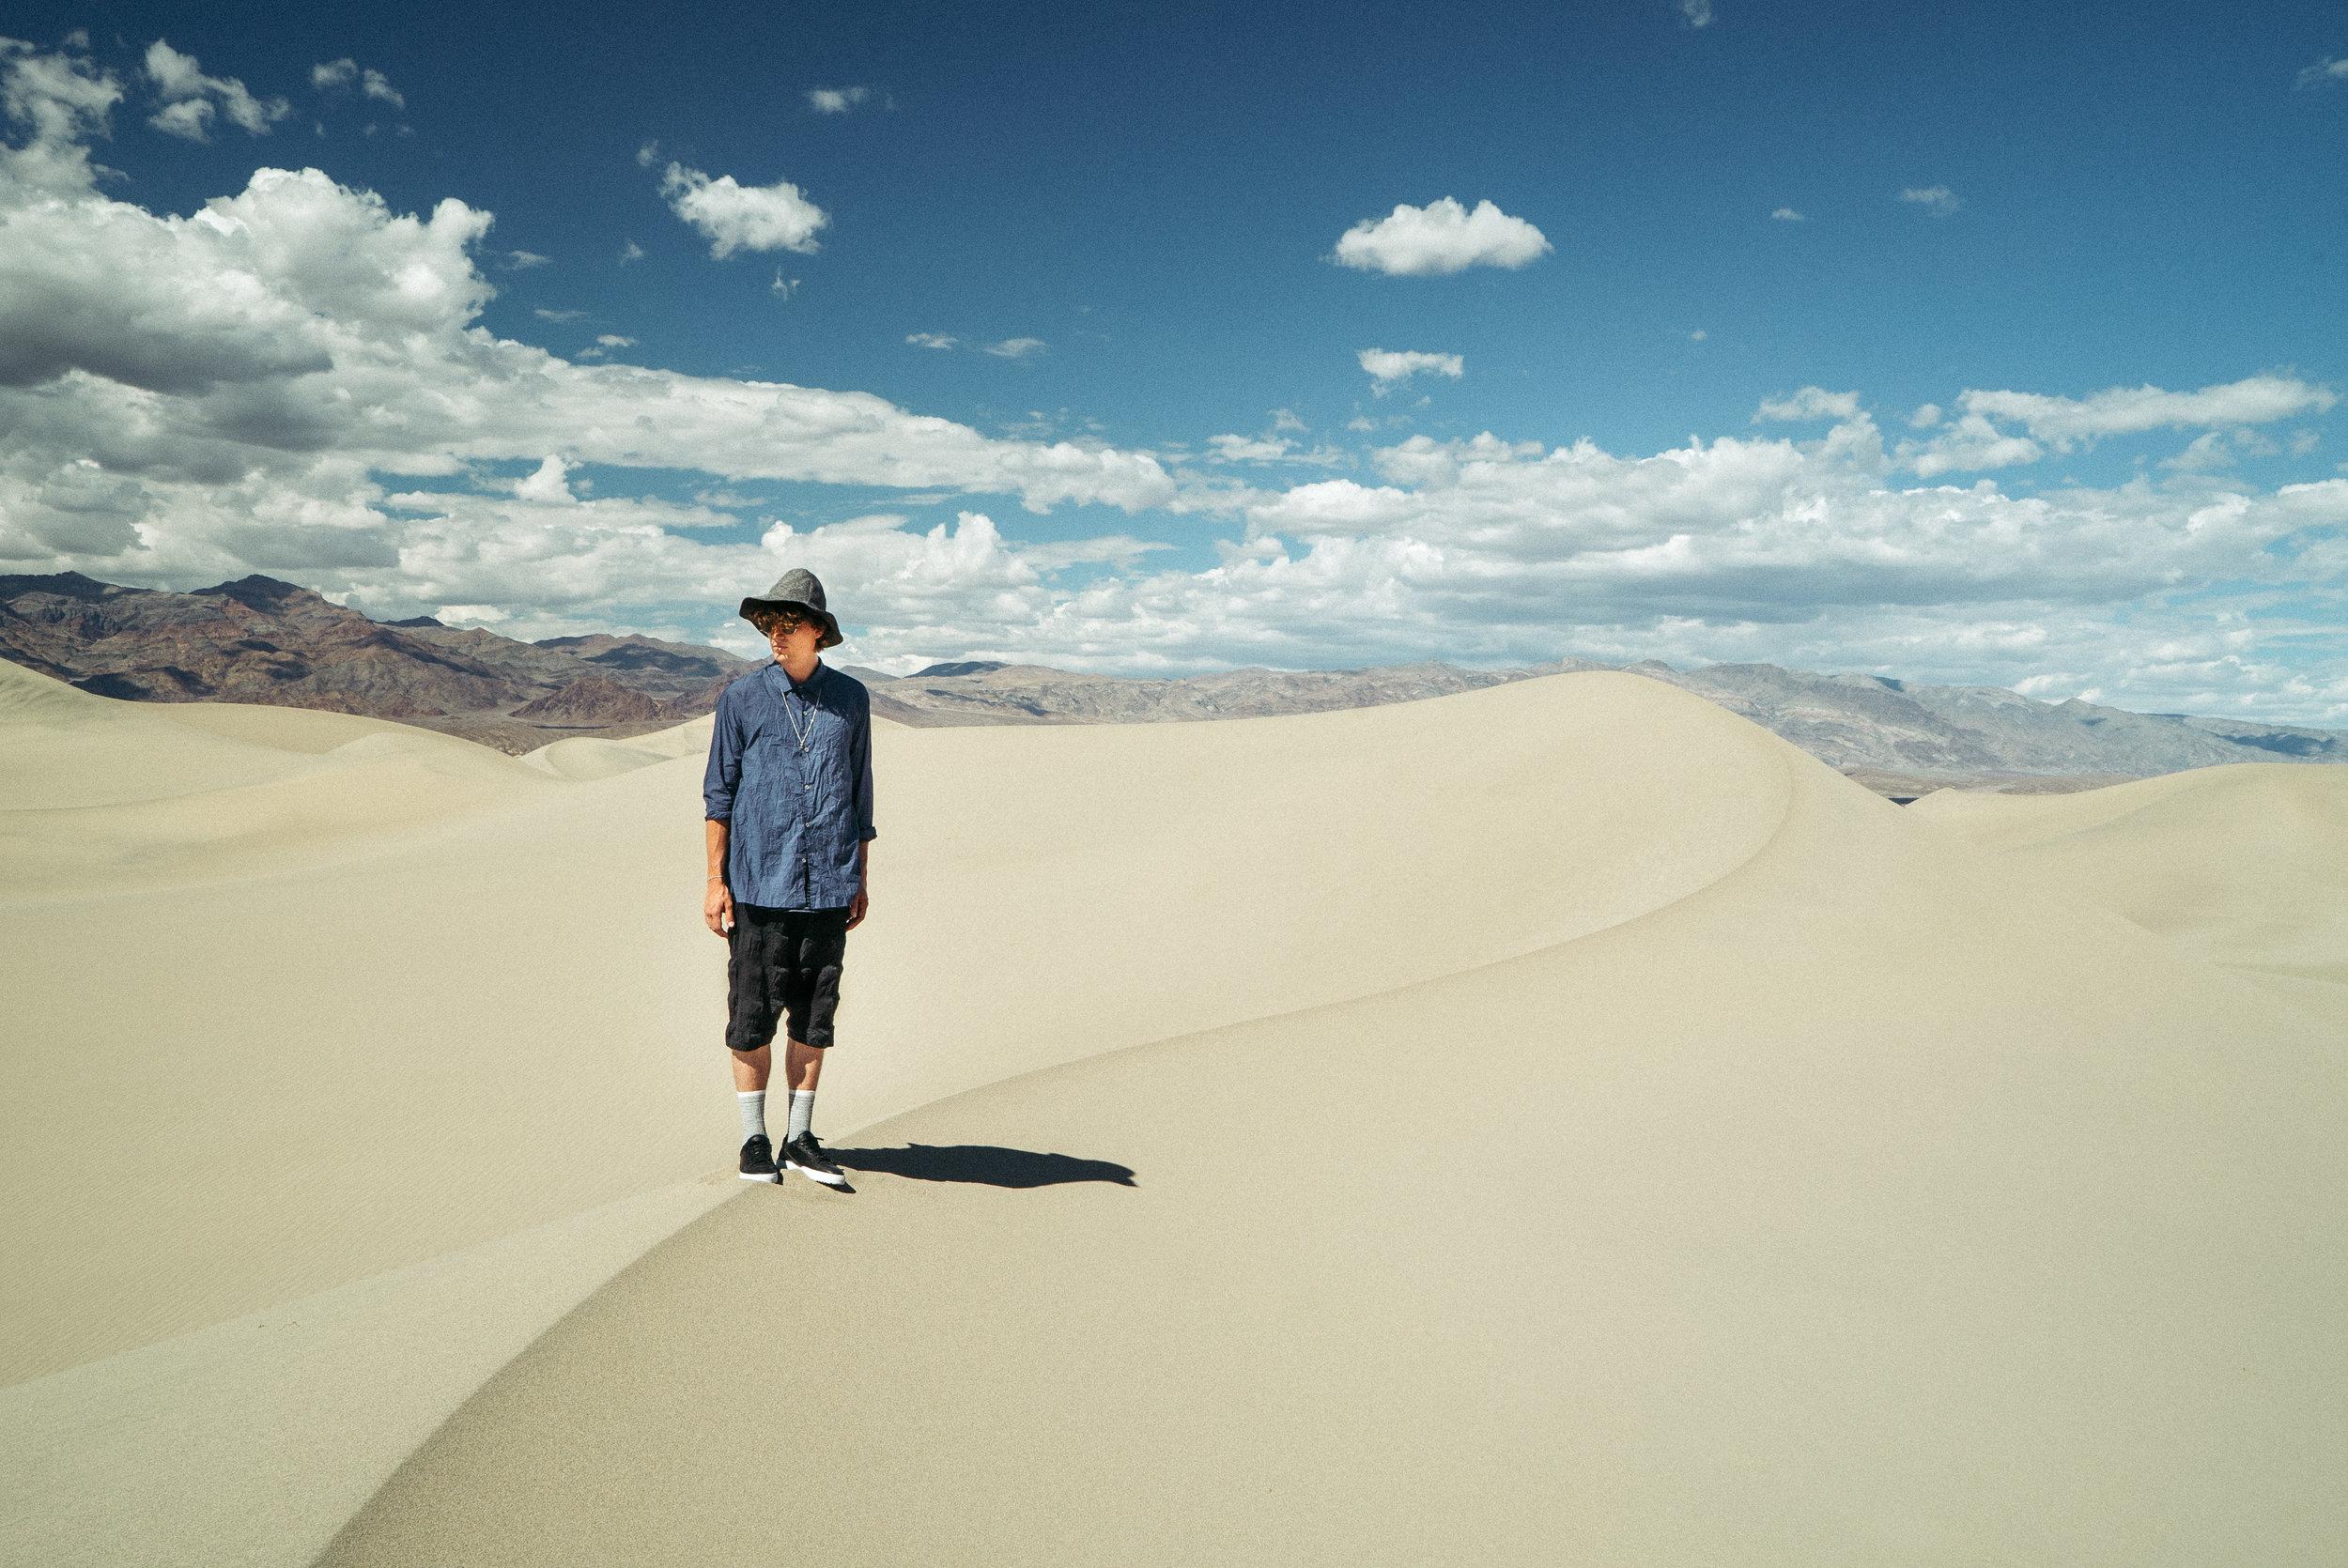 dunes - ridgeline - LIGHTclean.jpg